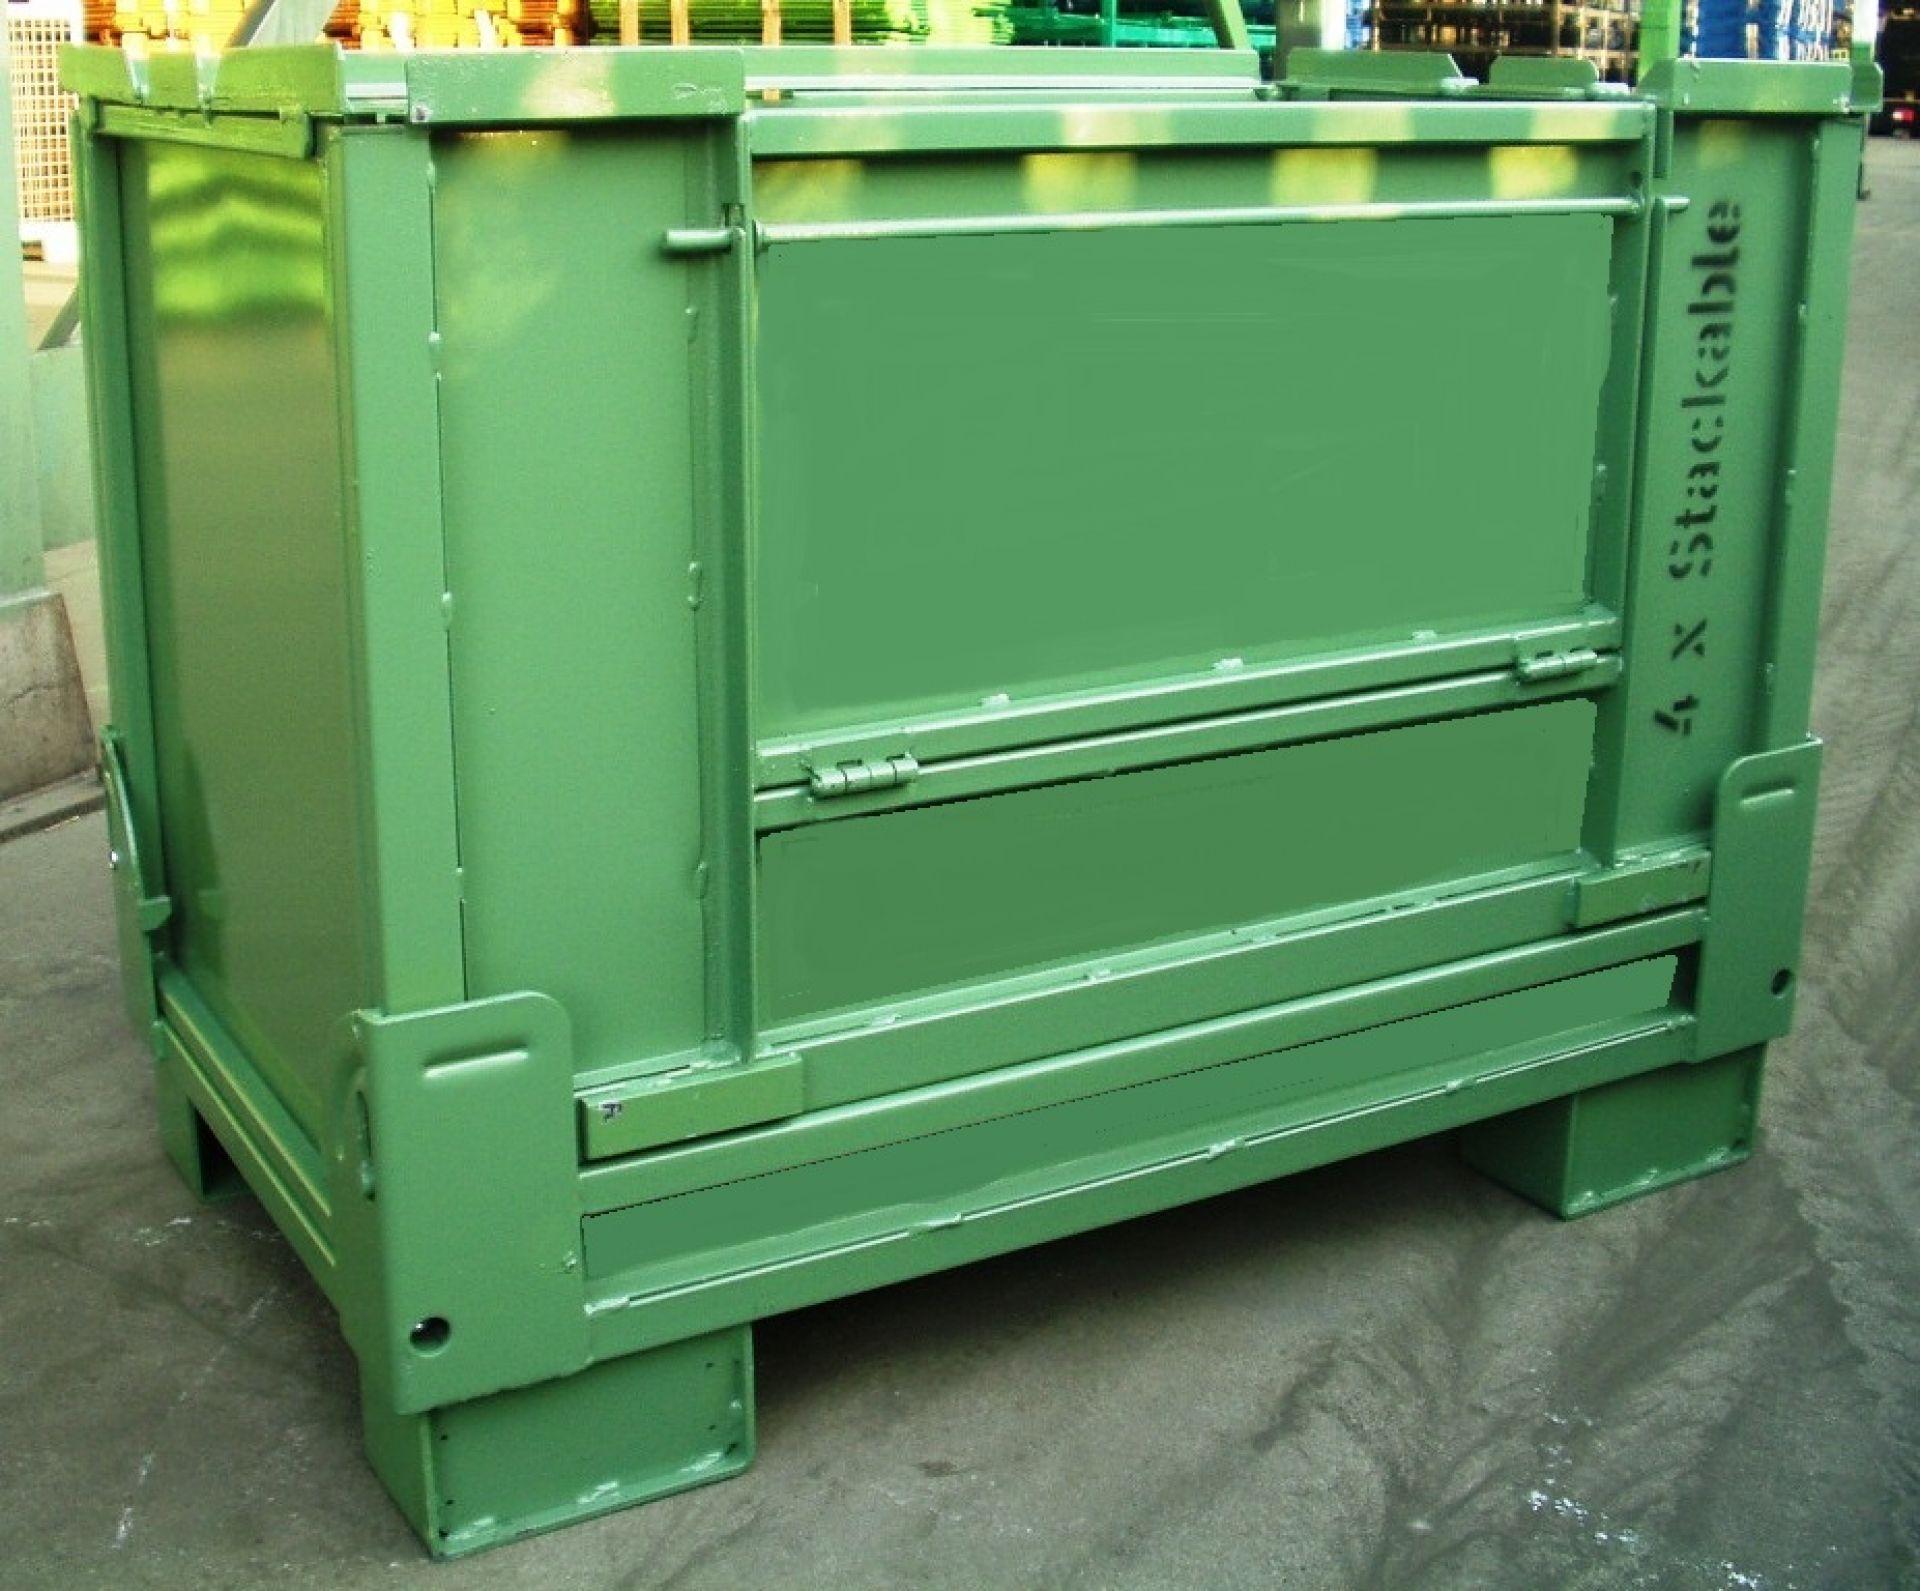 faltbarer Universalbehälter Automotive grün